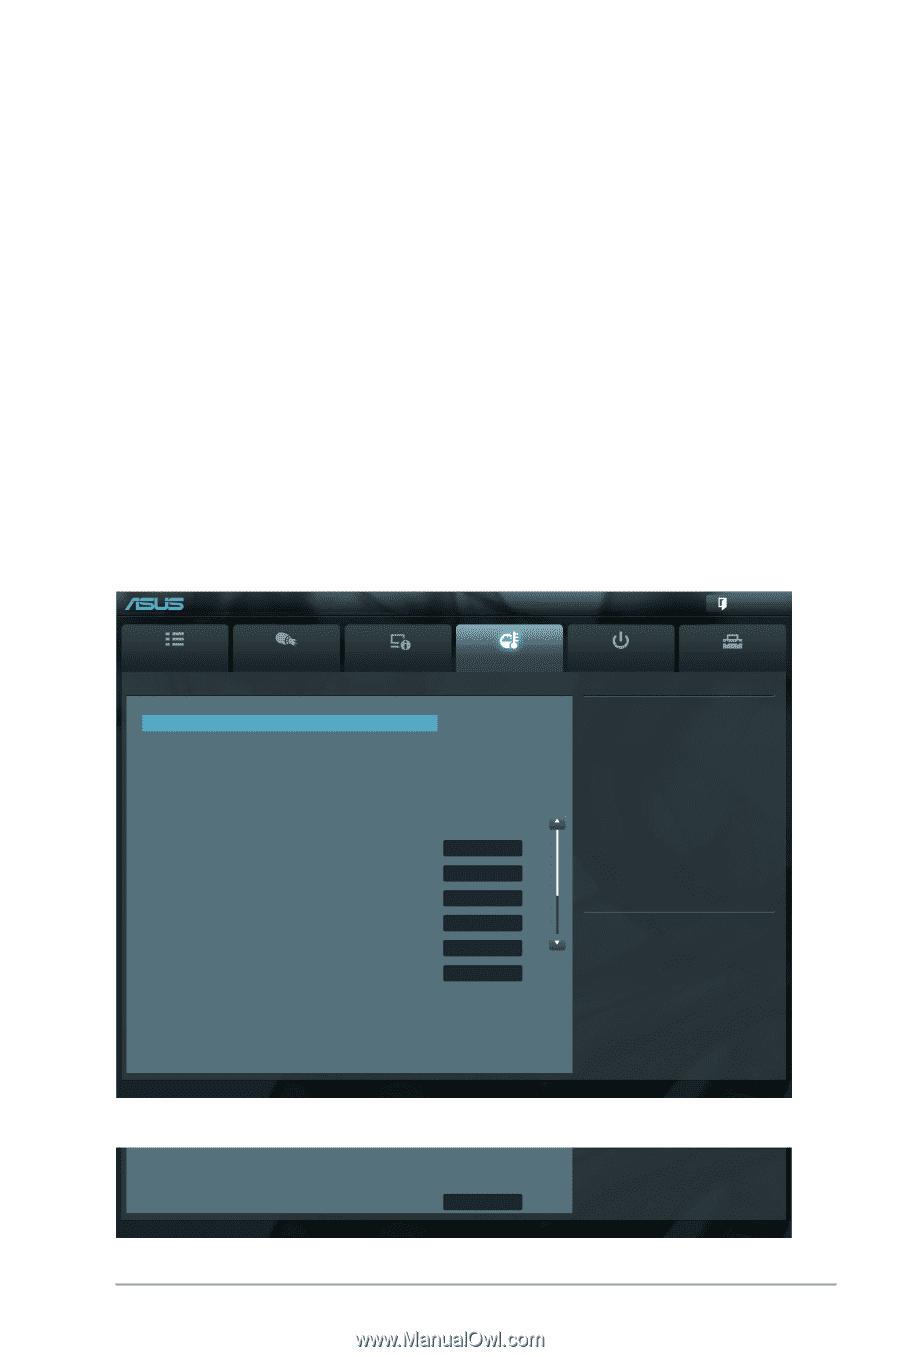 Asus P8Q77-M AHCI/ RAID Drivers for Mac Download